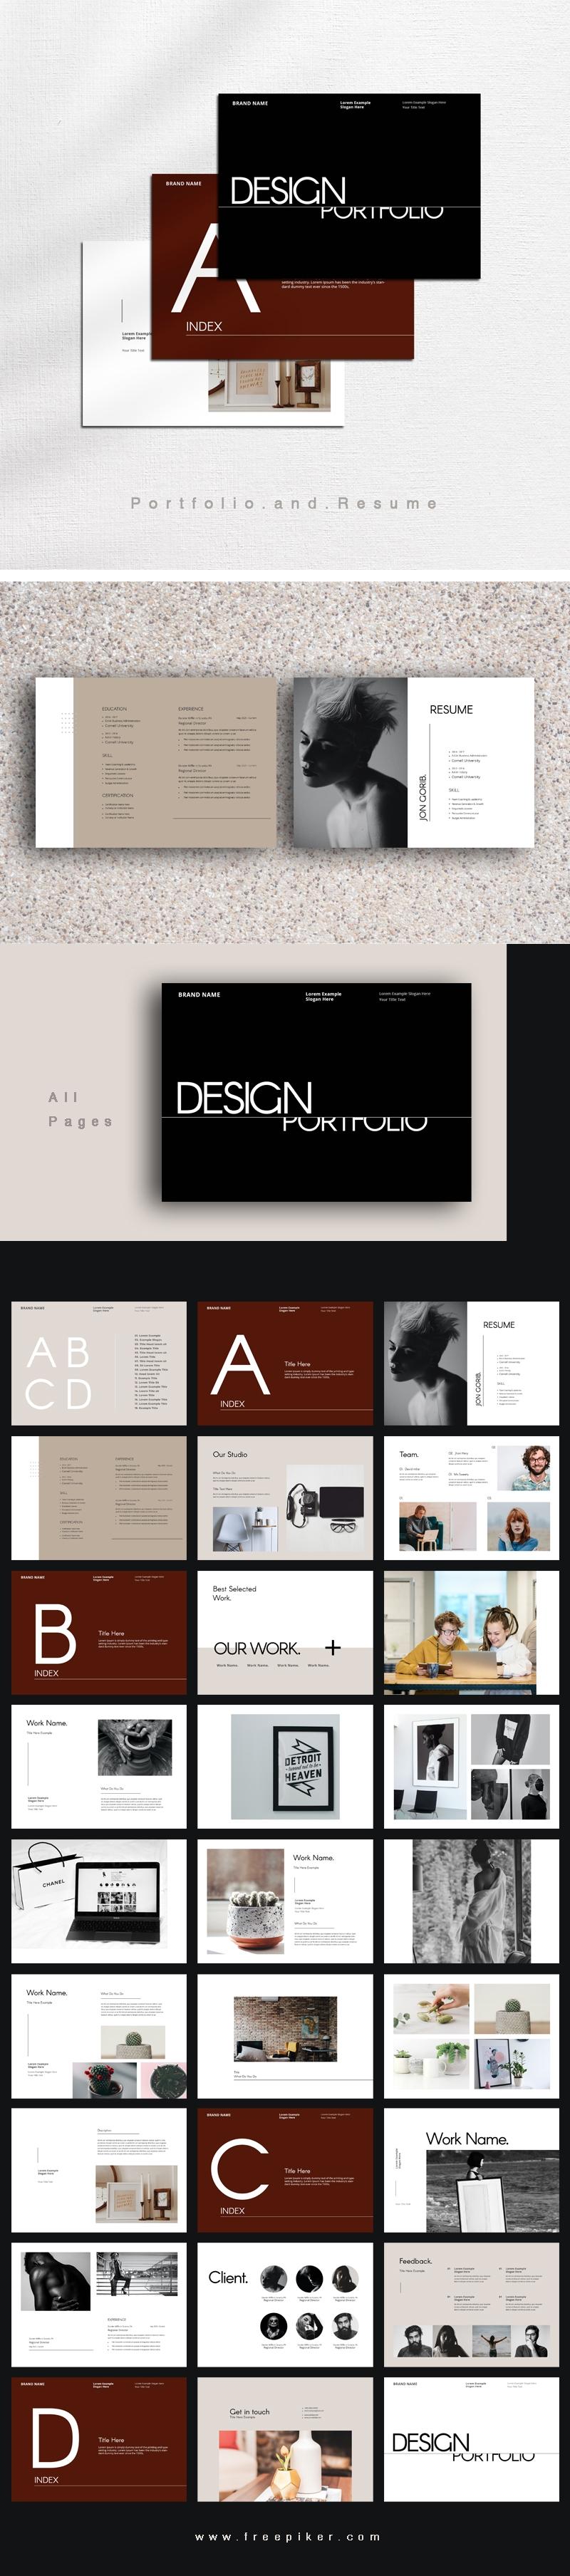 Typo Portfolio and Resume Template